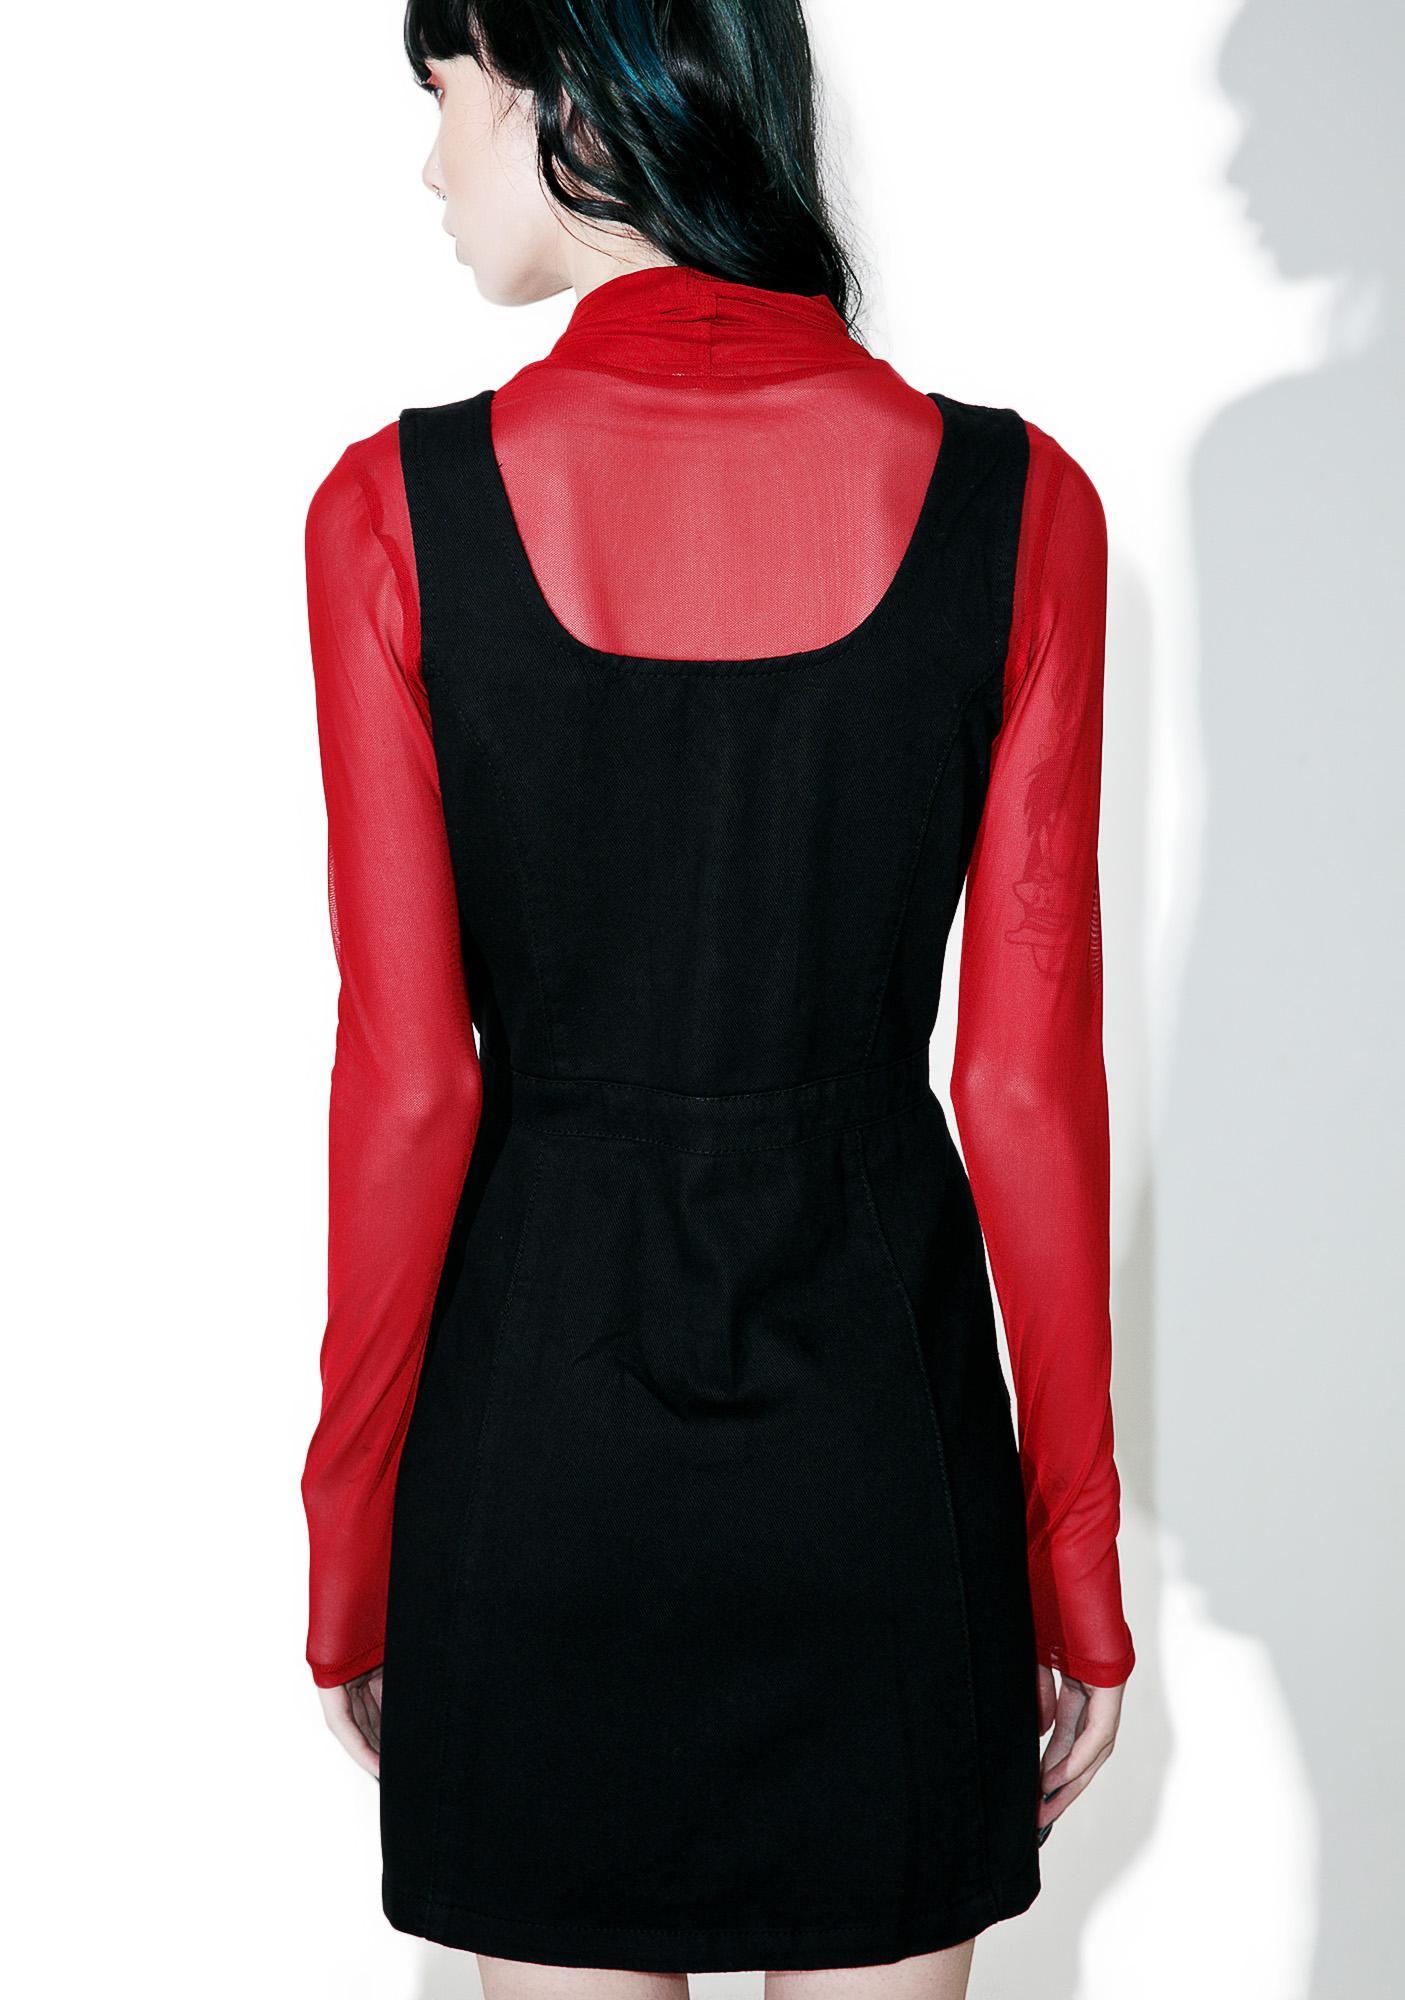 Glamorous Down Home Denim Dress